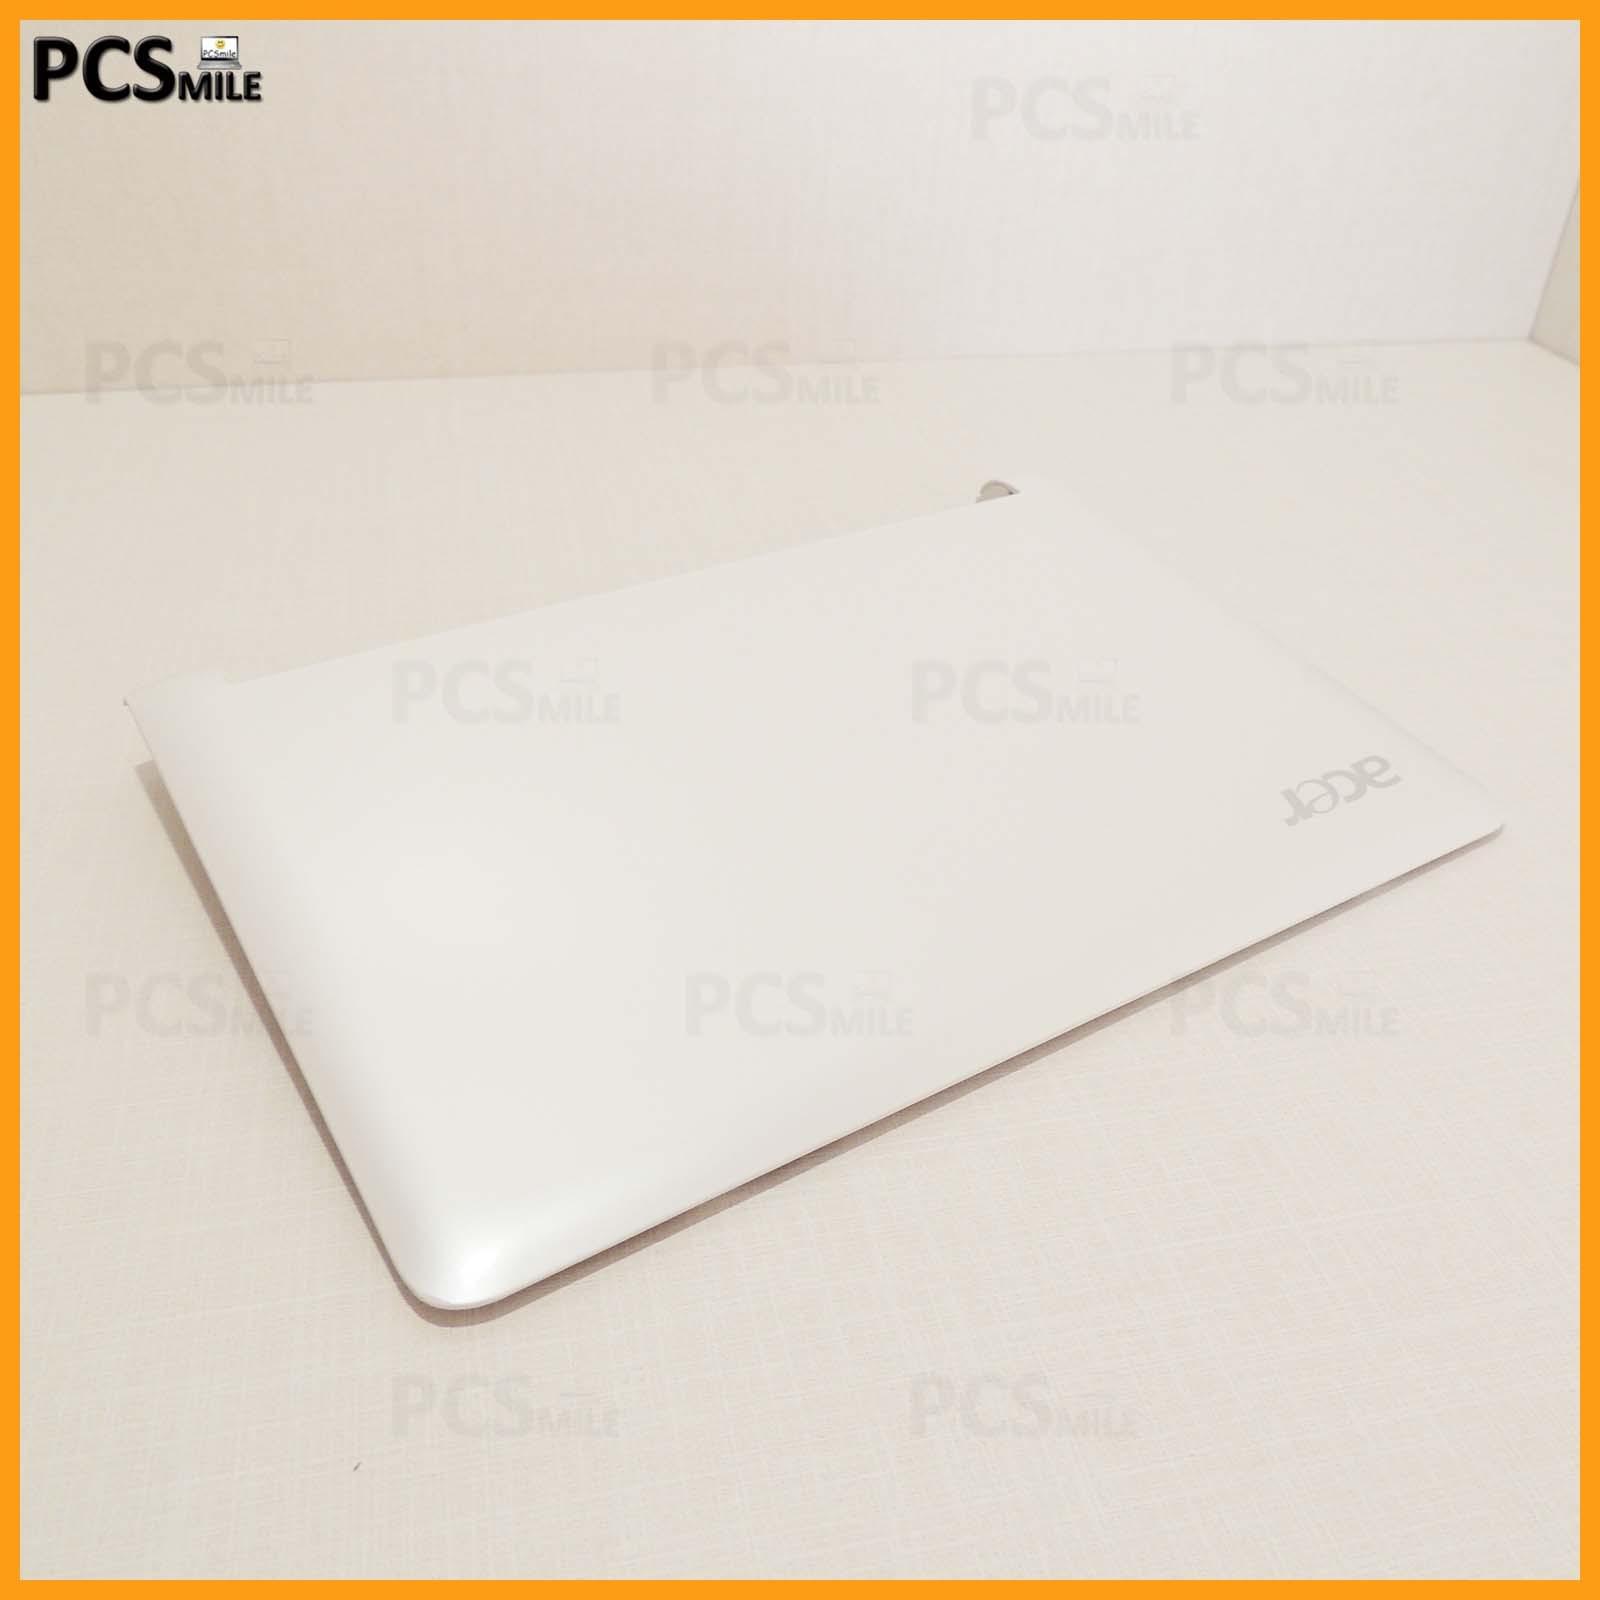 Scocca posteriore LCD per Acer Aspire One ZG5 ZYE3AZG5LCTNQ0080912-20 REV: 3A